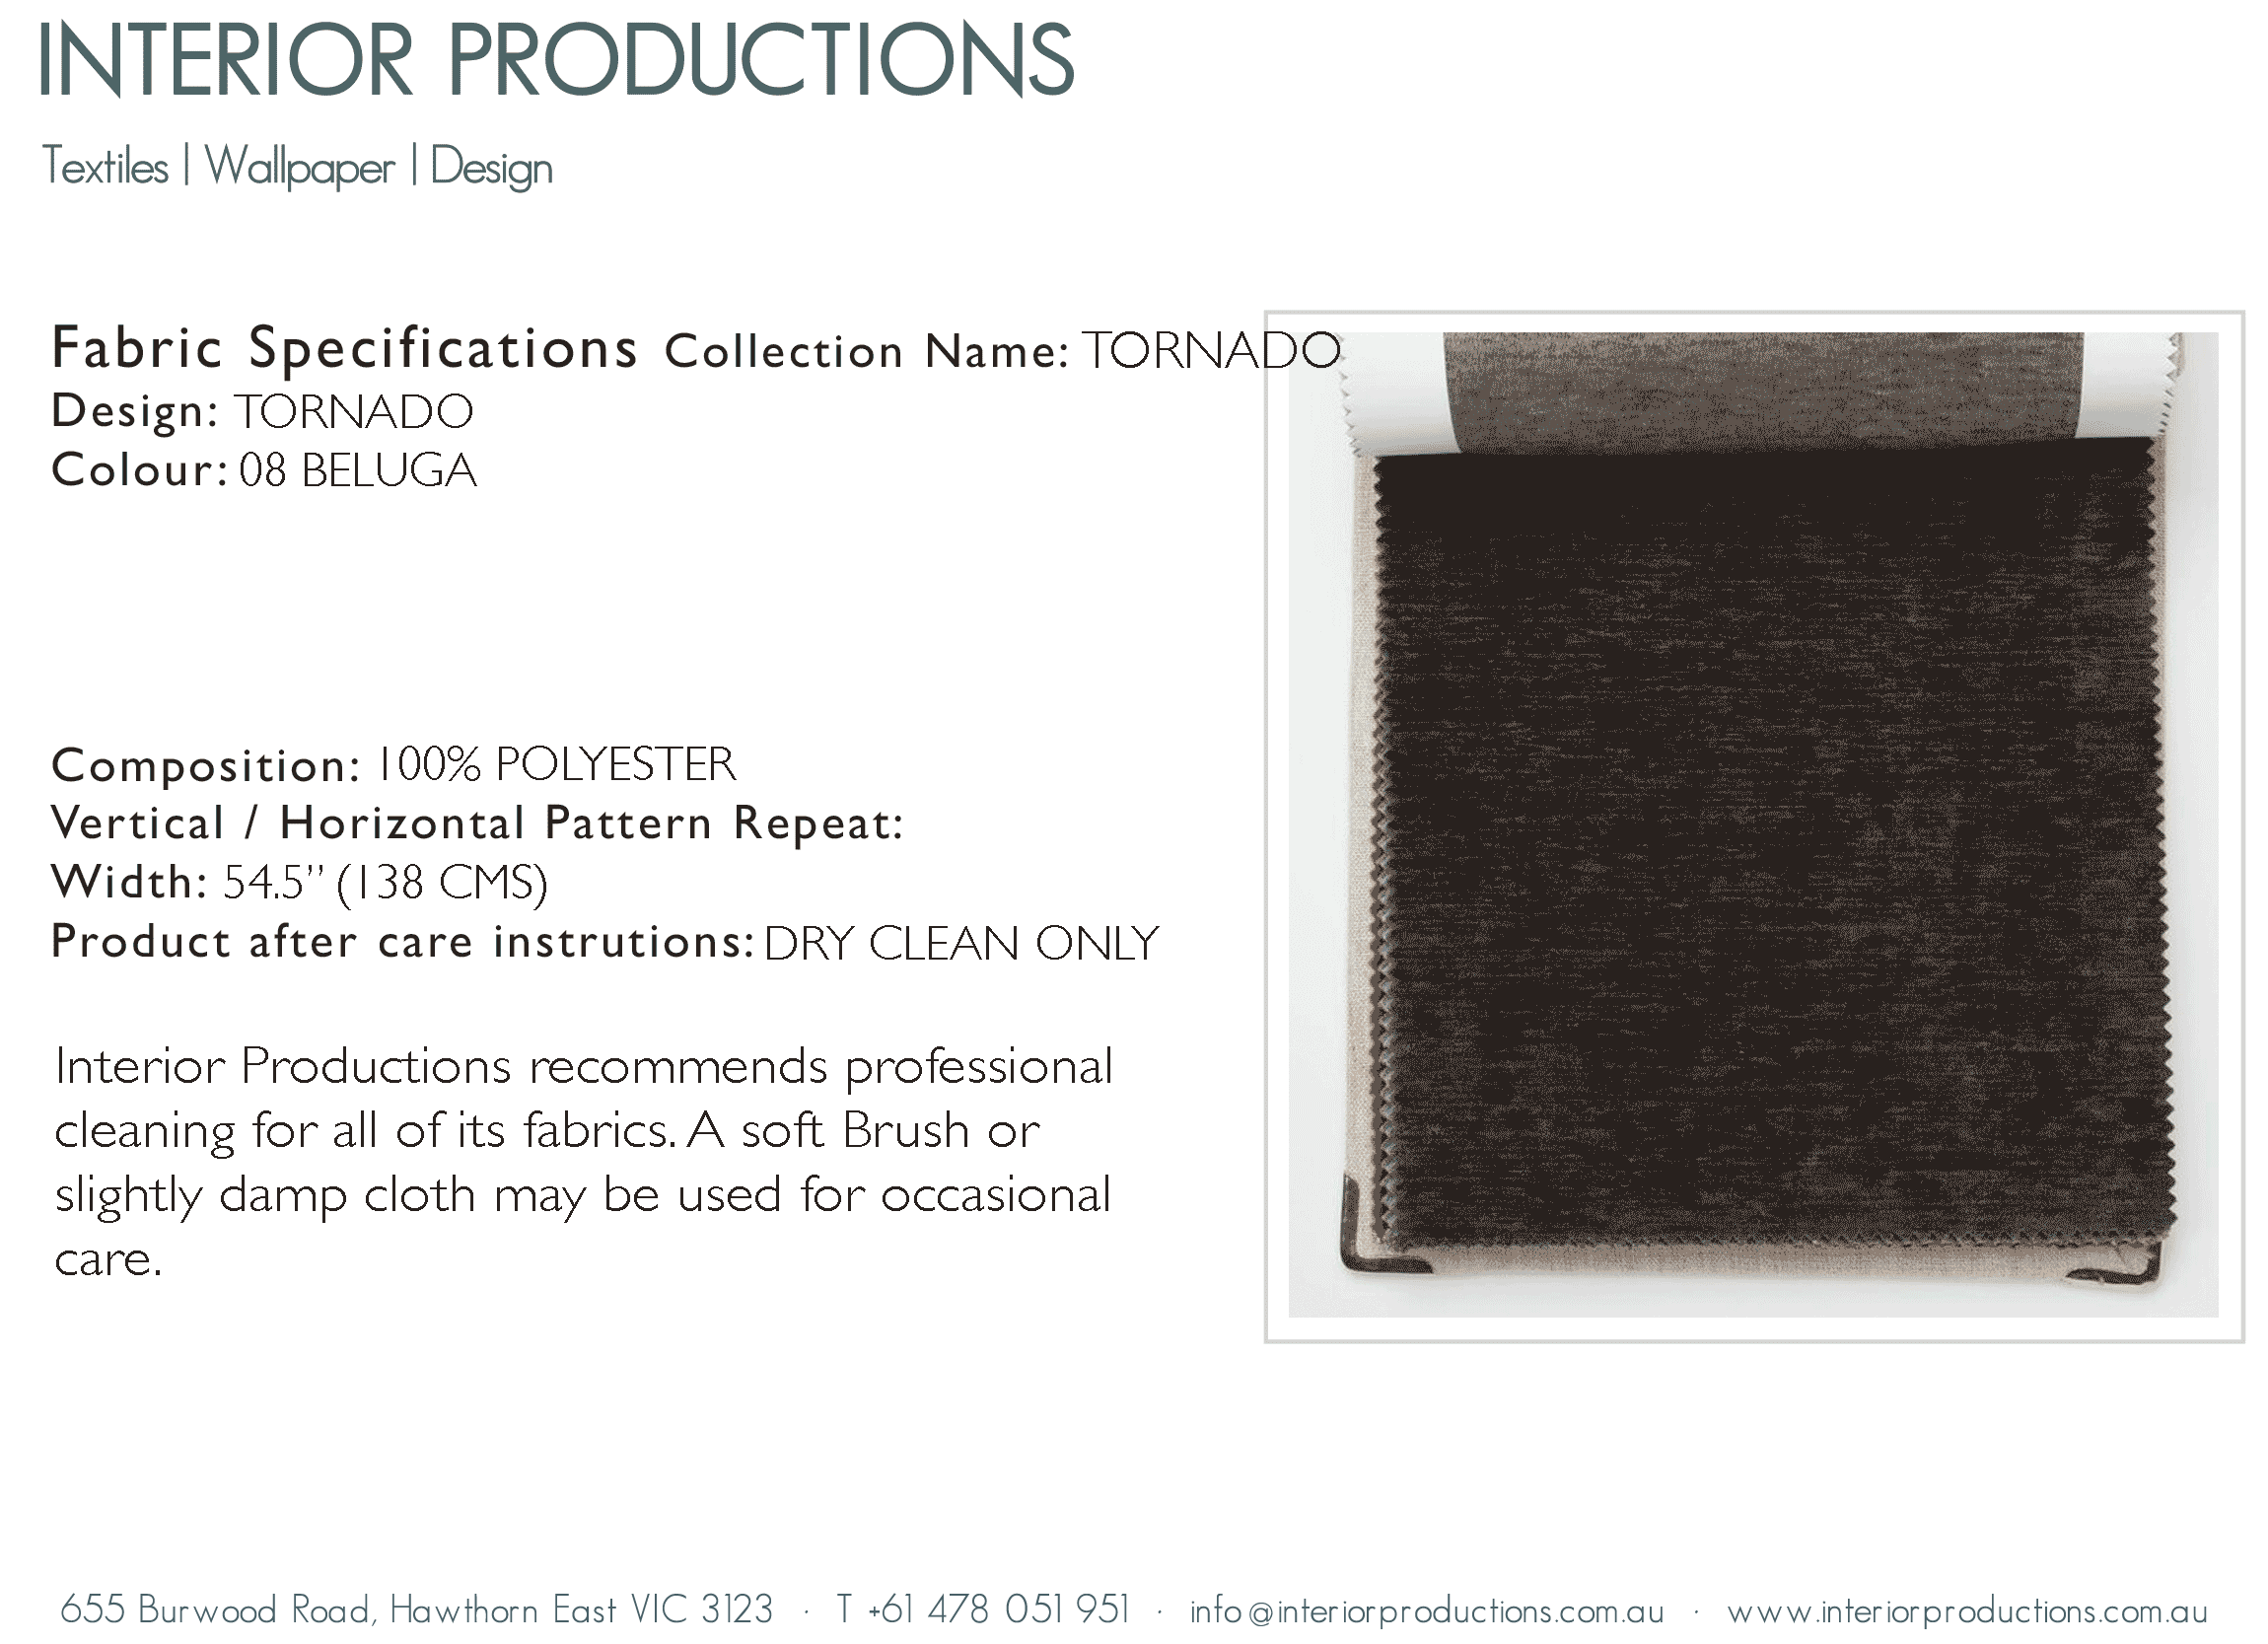 interior_productions_TORNADO---08-BELUGA